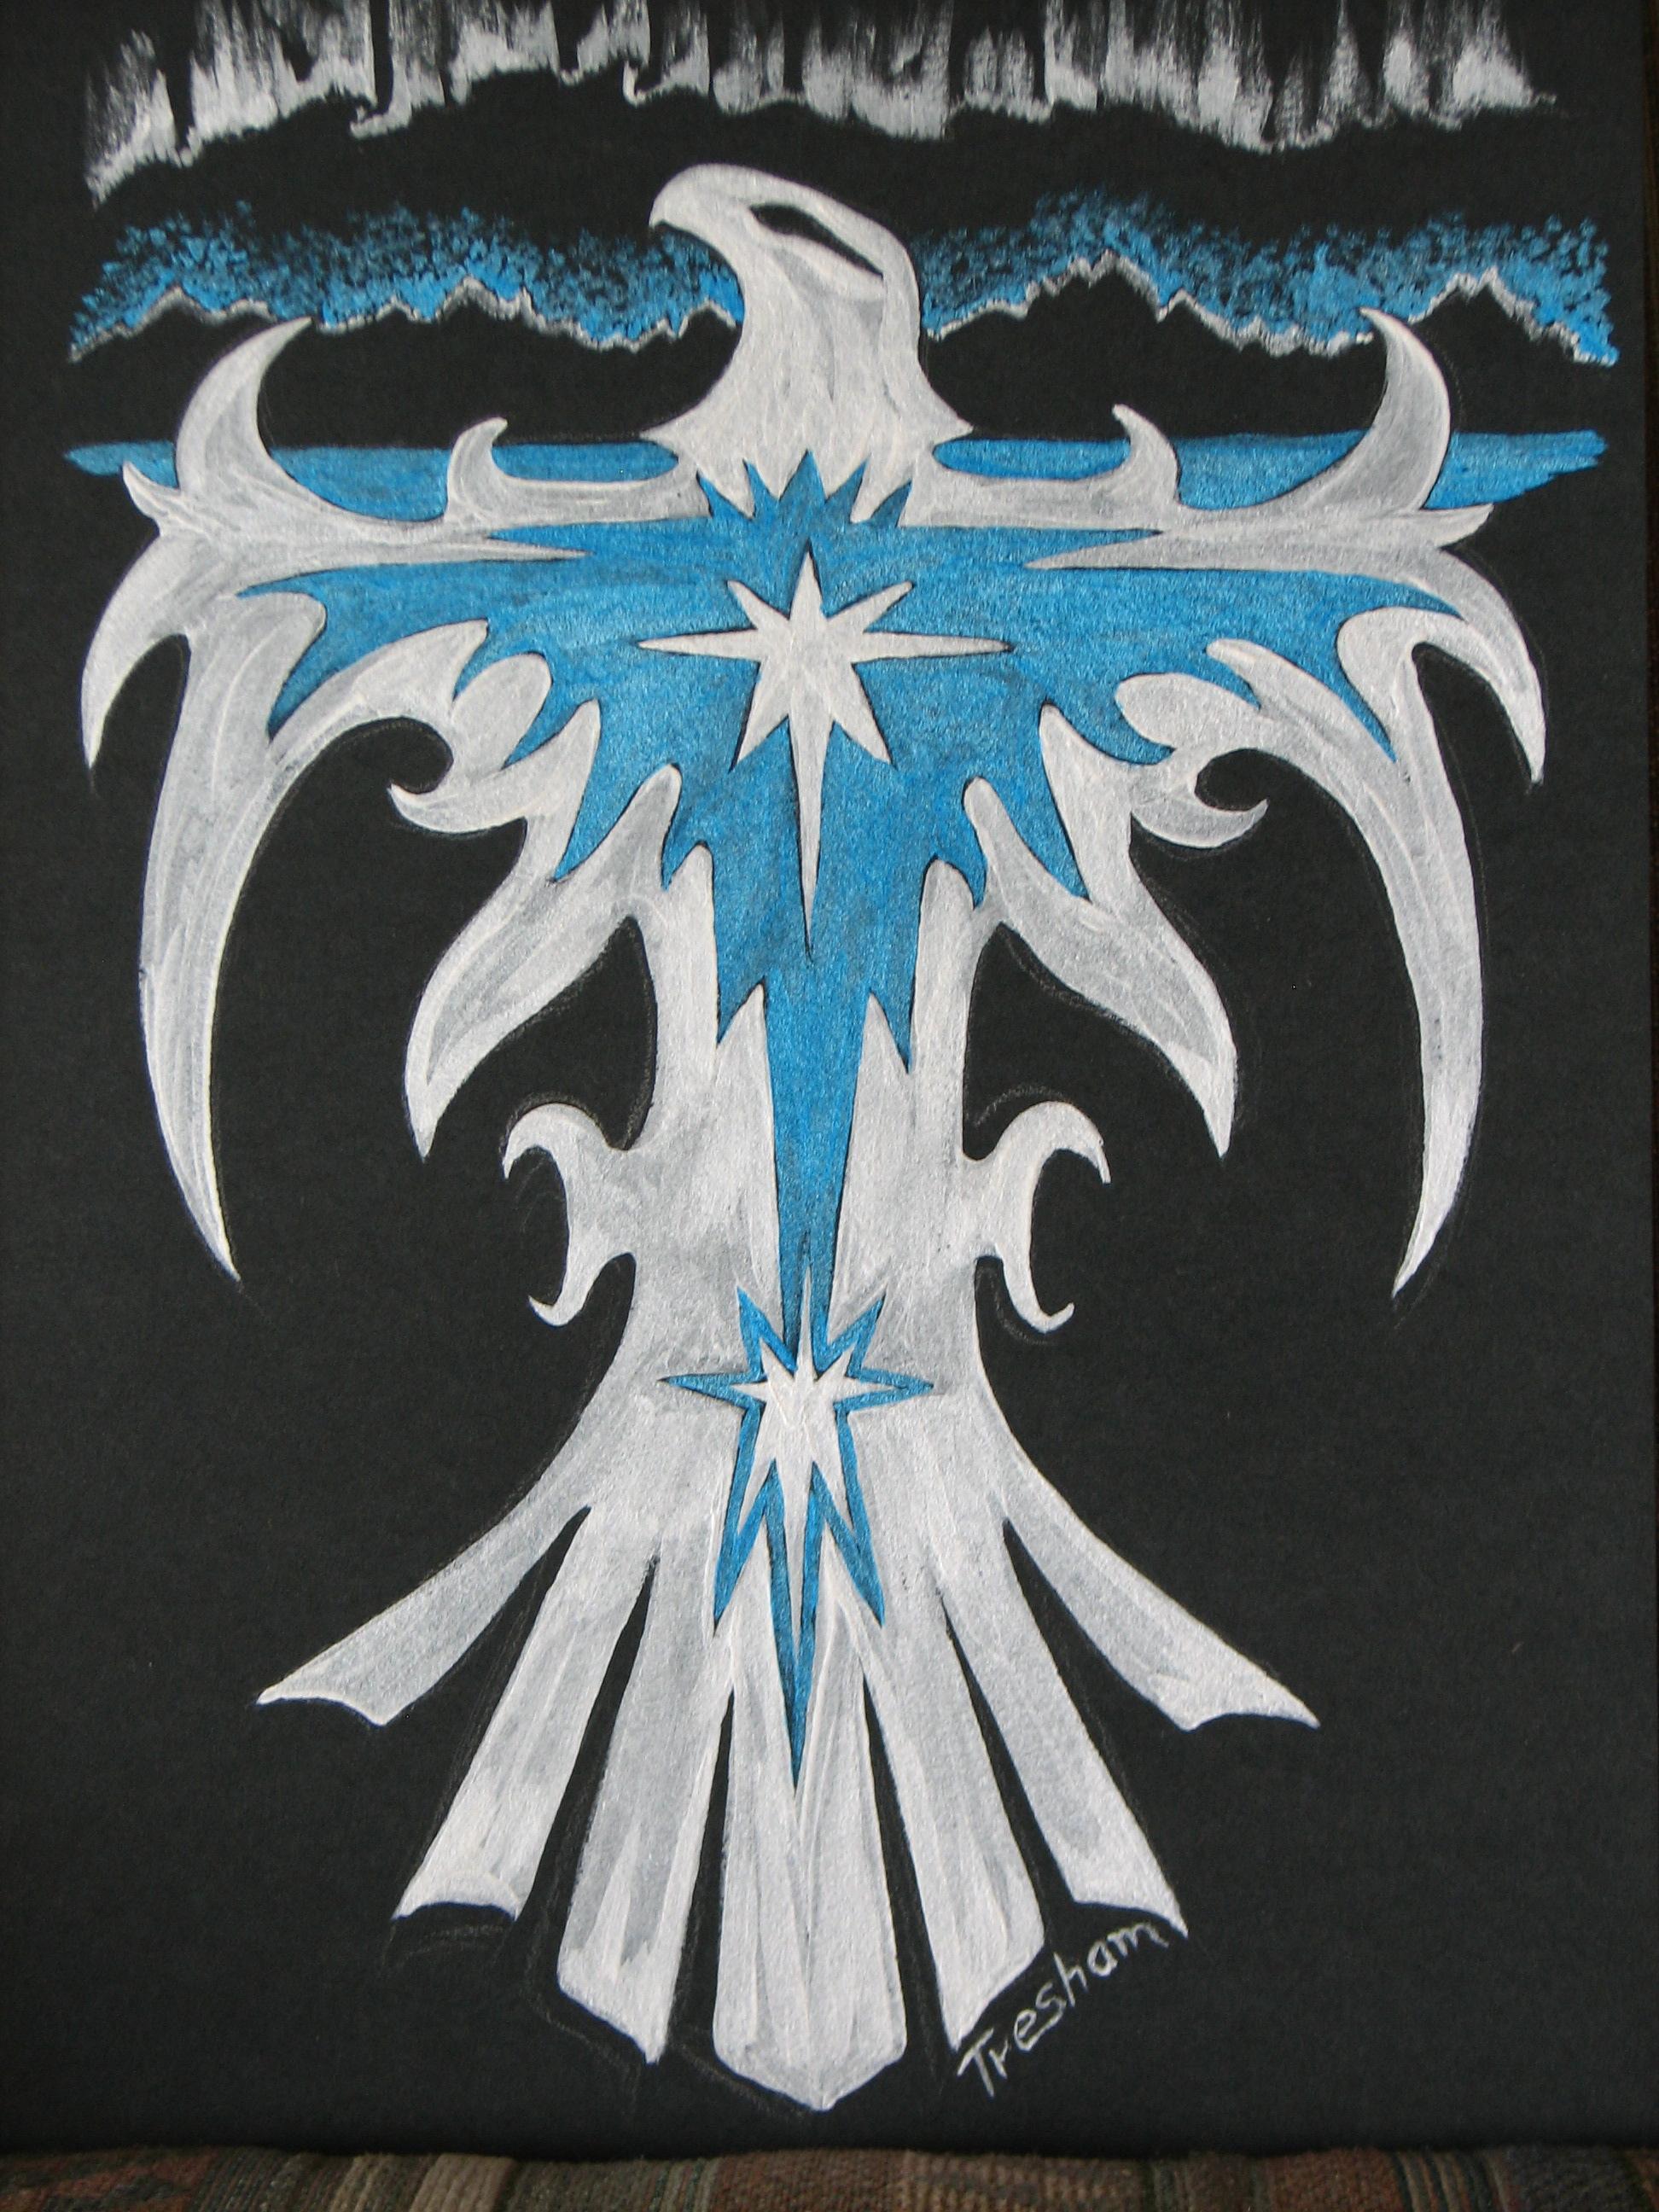 Alaskan Art, T-shirts, Eagles, Spirit, men's clothing